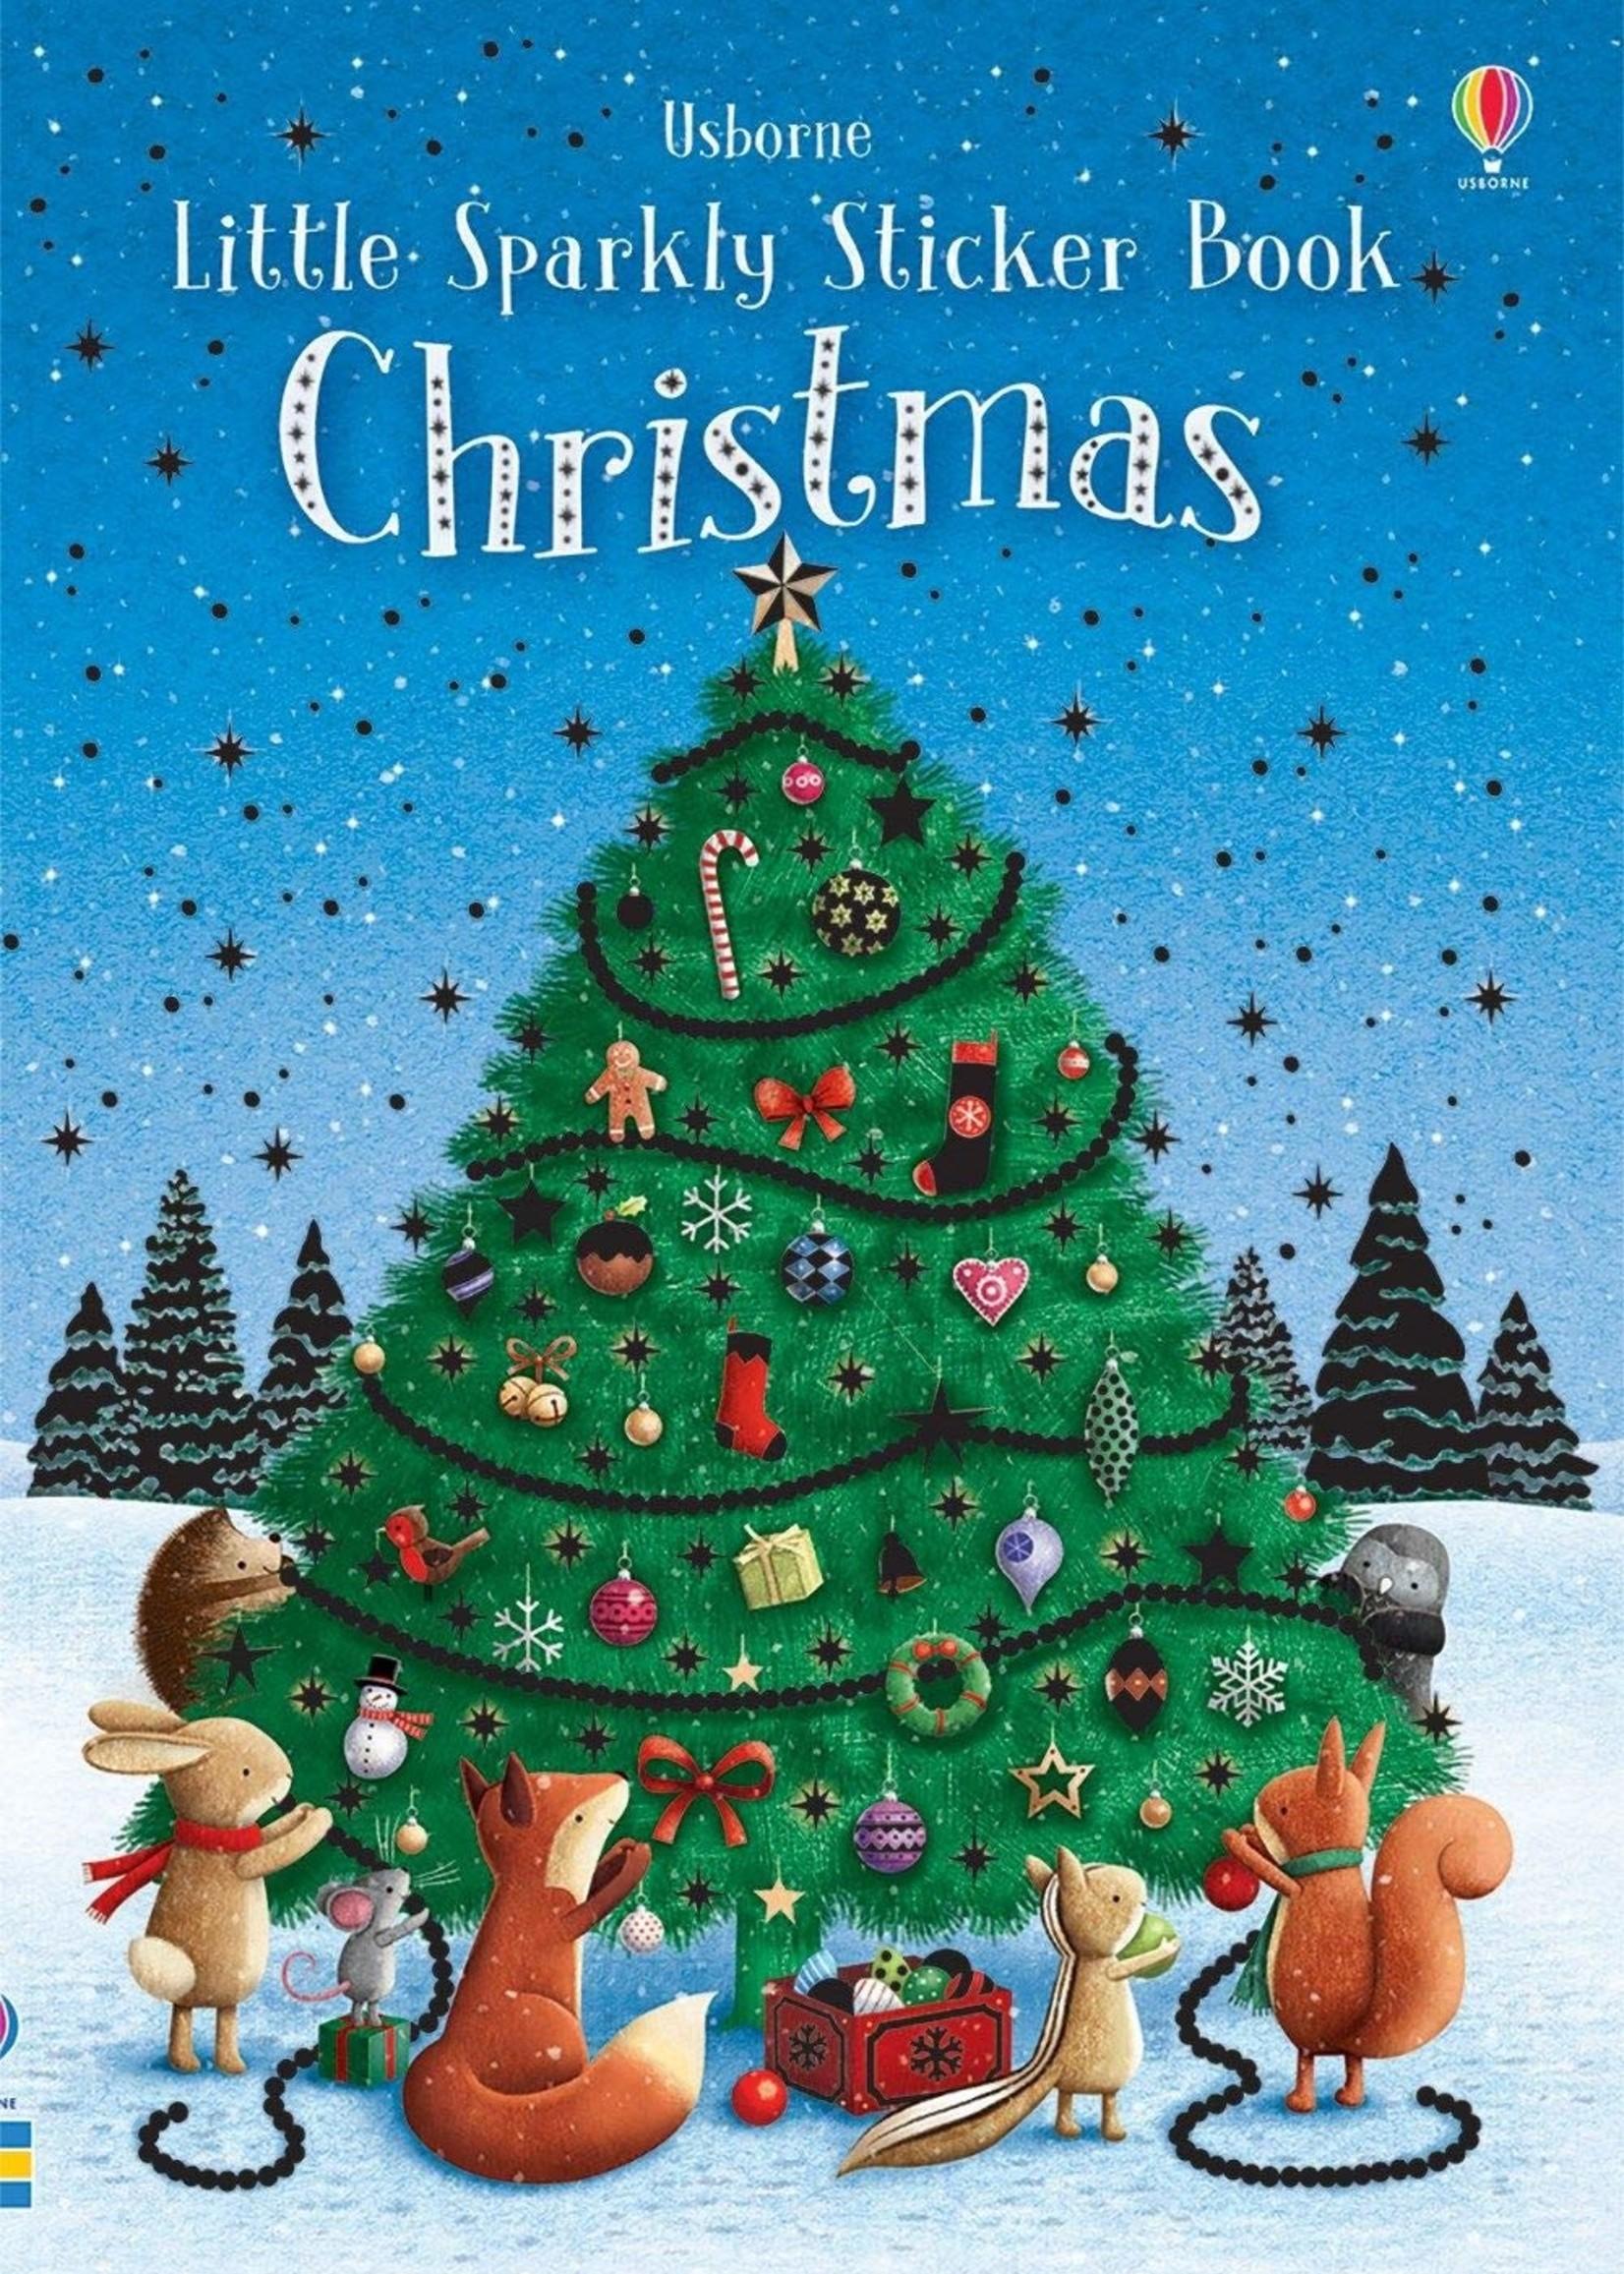 Usborne Little Sparkly Sticker Book, Christmas - Paperback